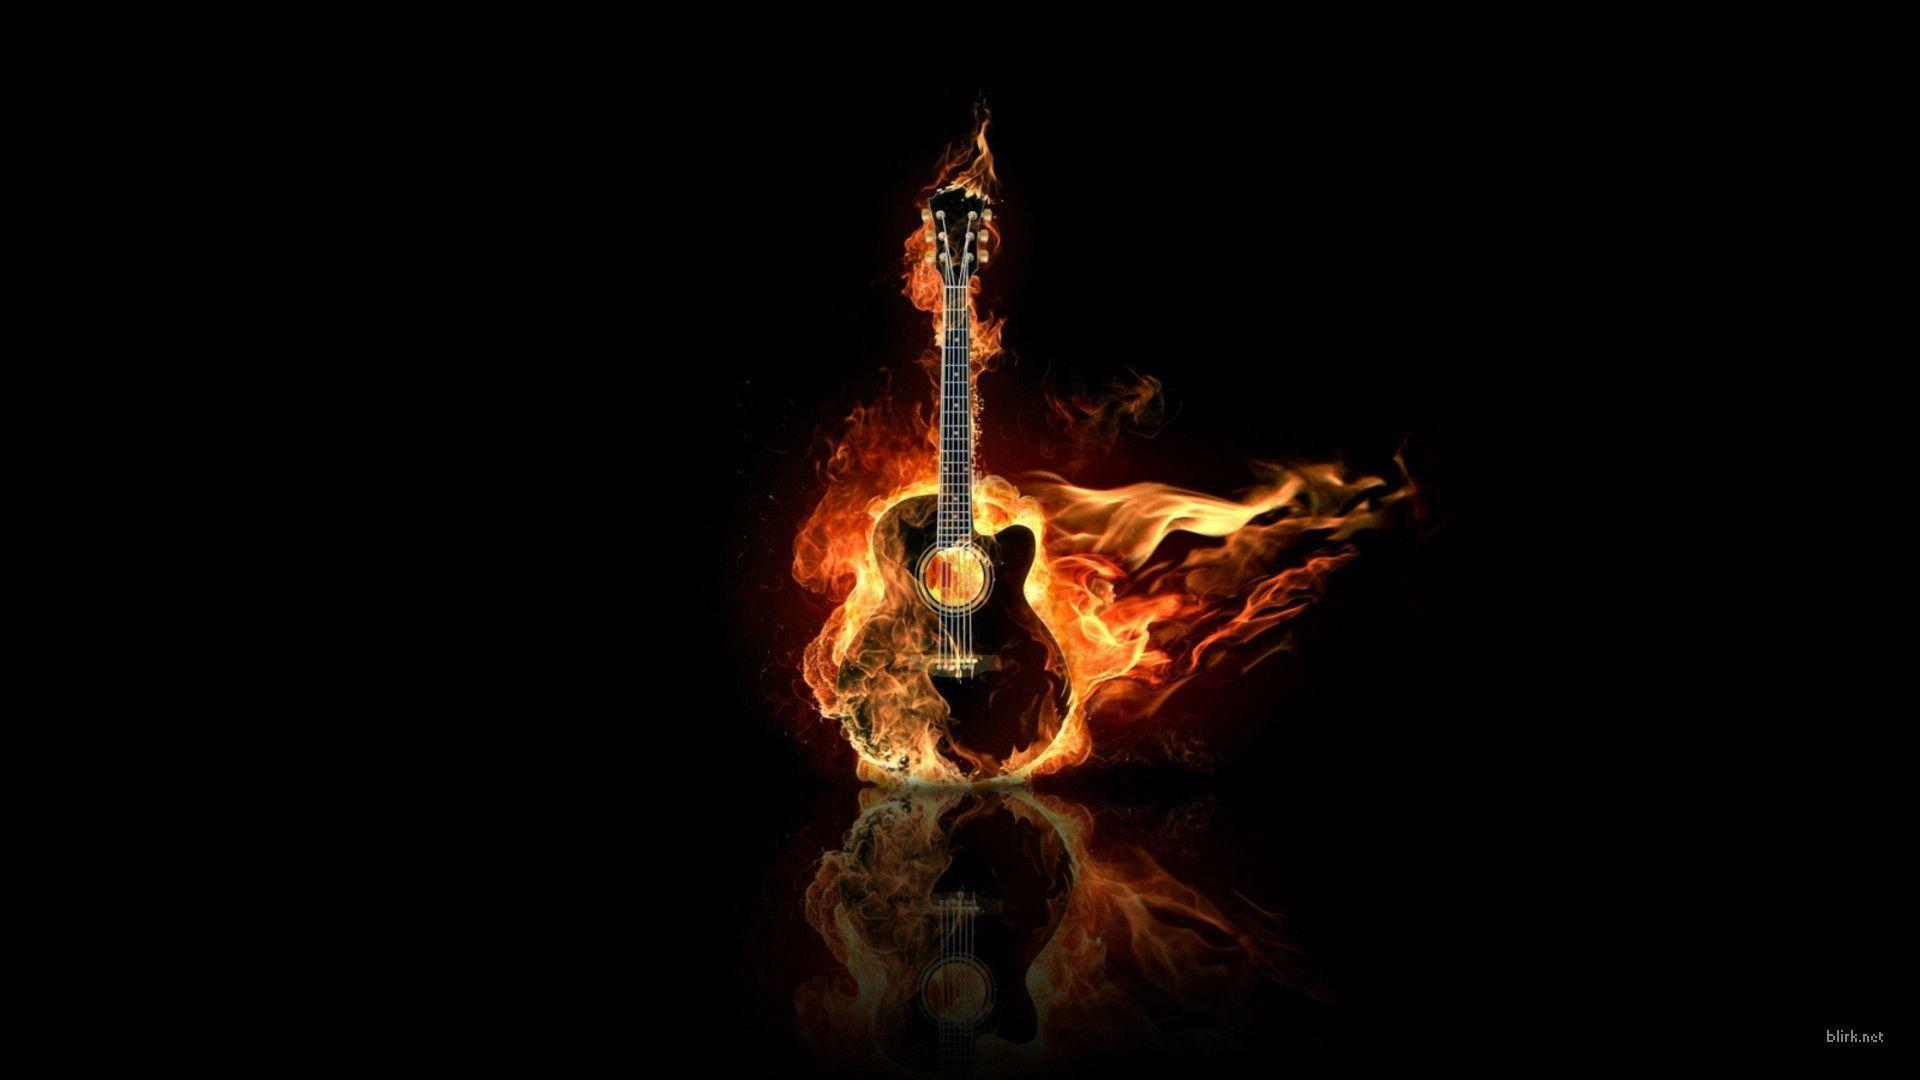 Wallpapers For > Guitar Wallpaper Hd